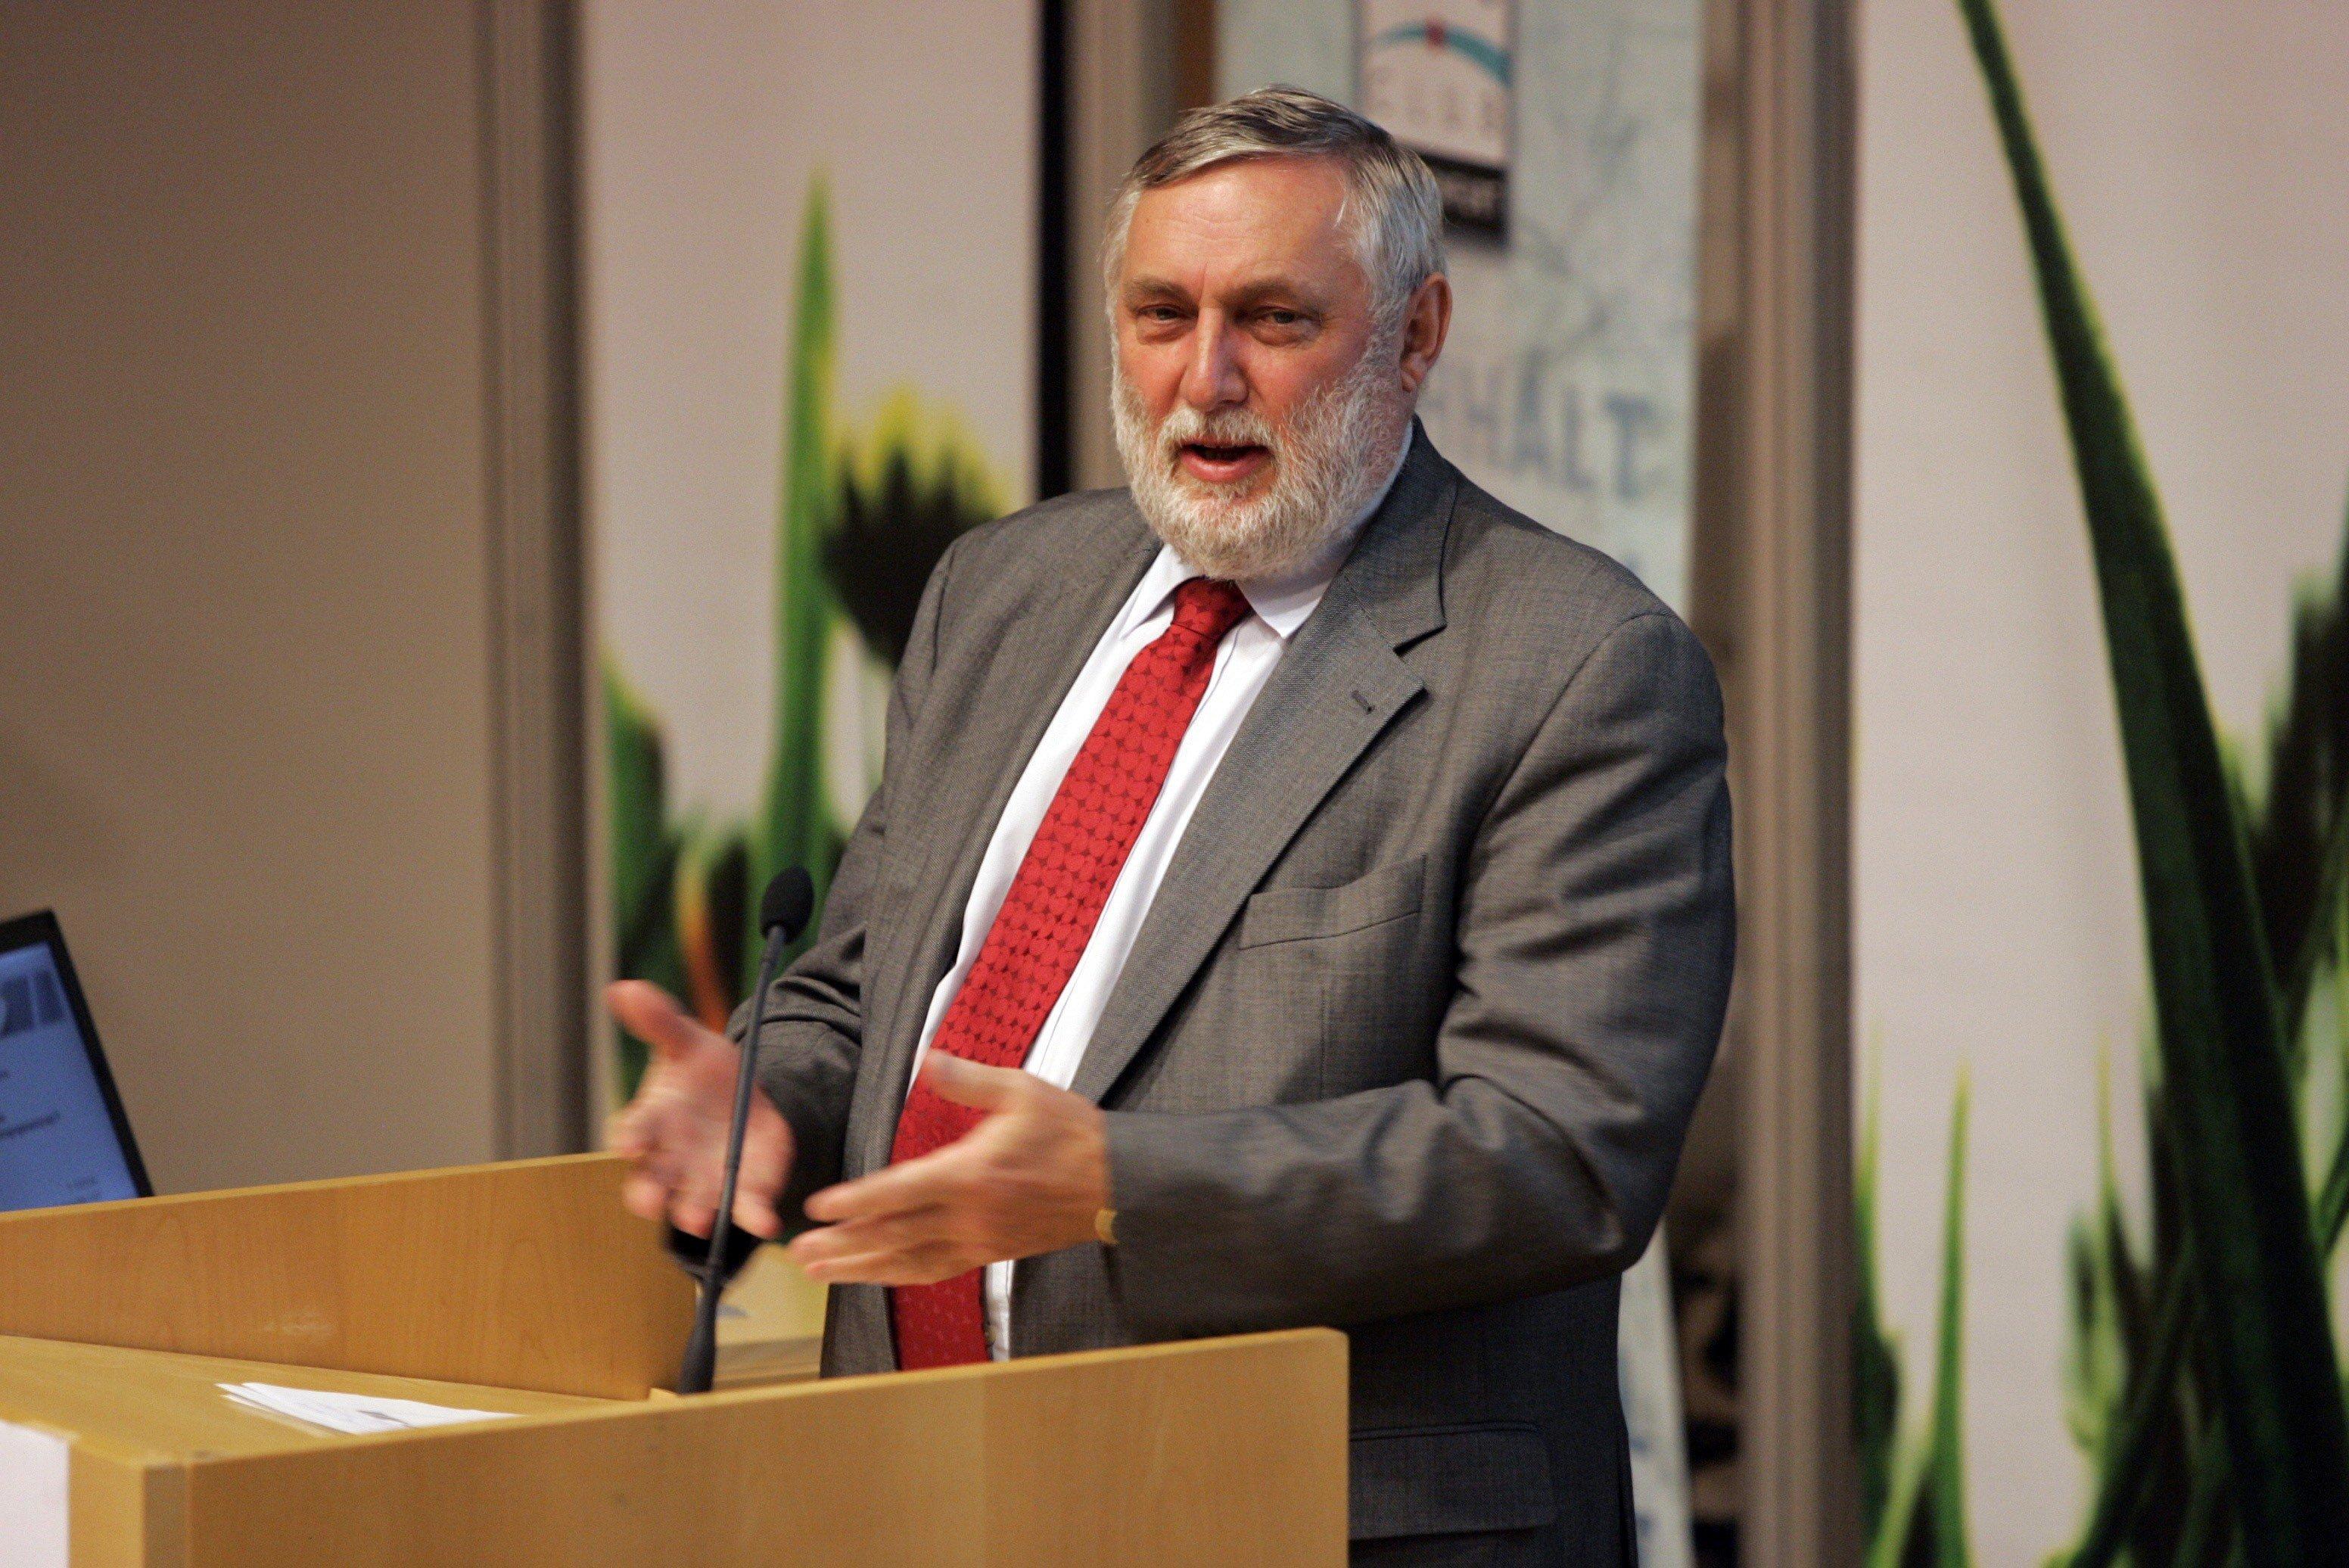 Presidenti i Forumit Evropian Aplbach, Franz Fischler viziton Kosovën